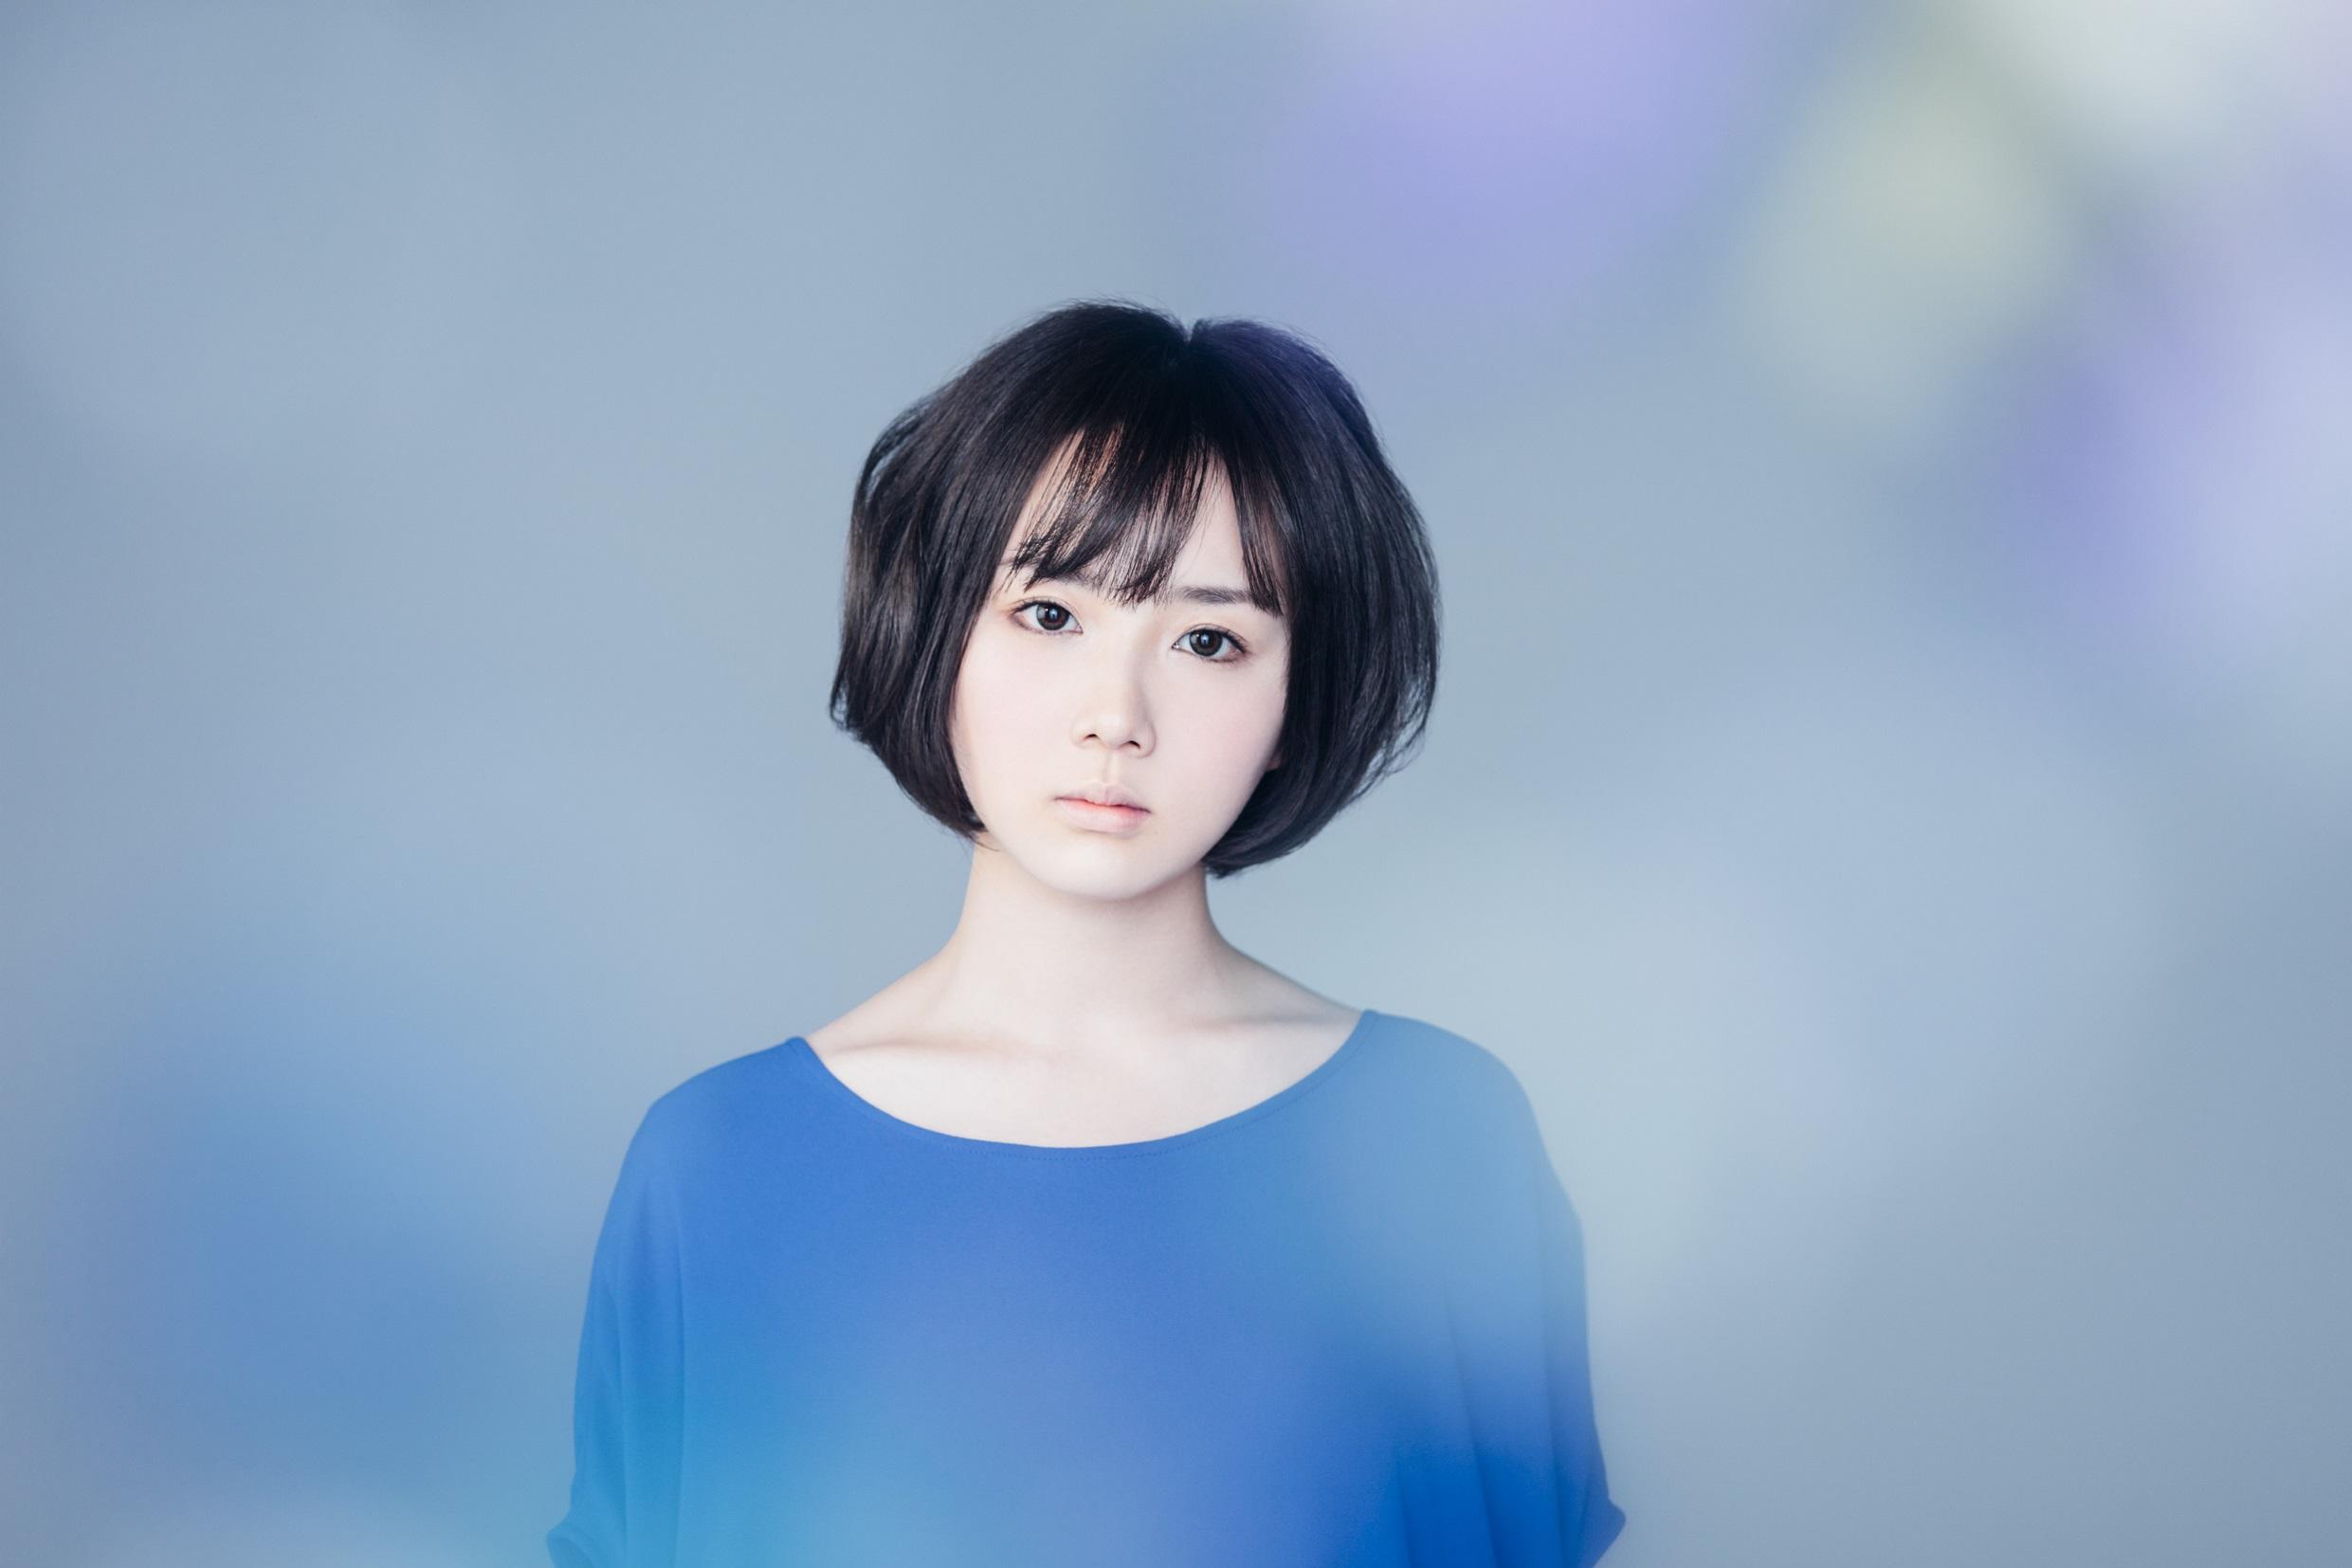 http://news.yoshimoto.co.jp/20170113175816-bde1fb37810dd2217d089ab92091102f93c9a362.jpg